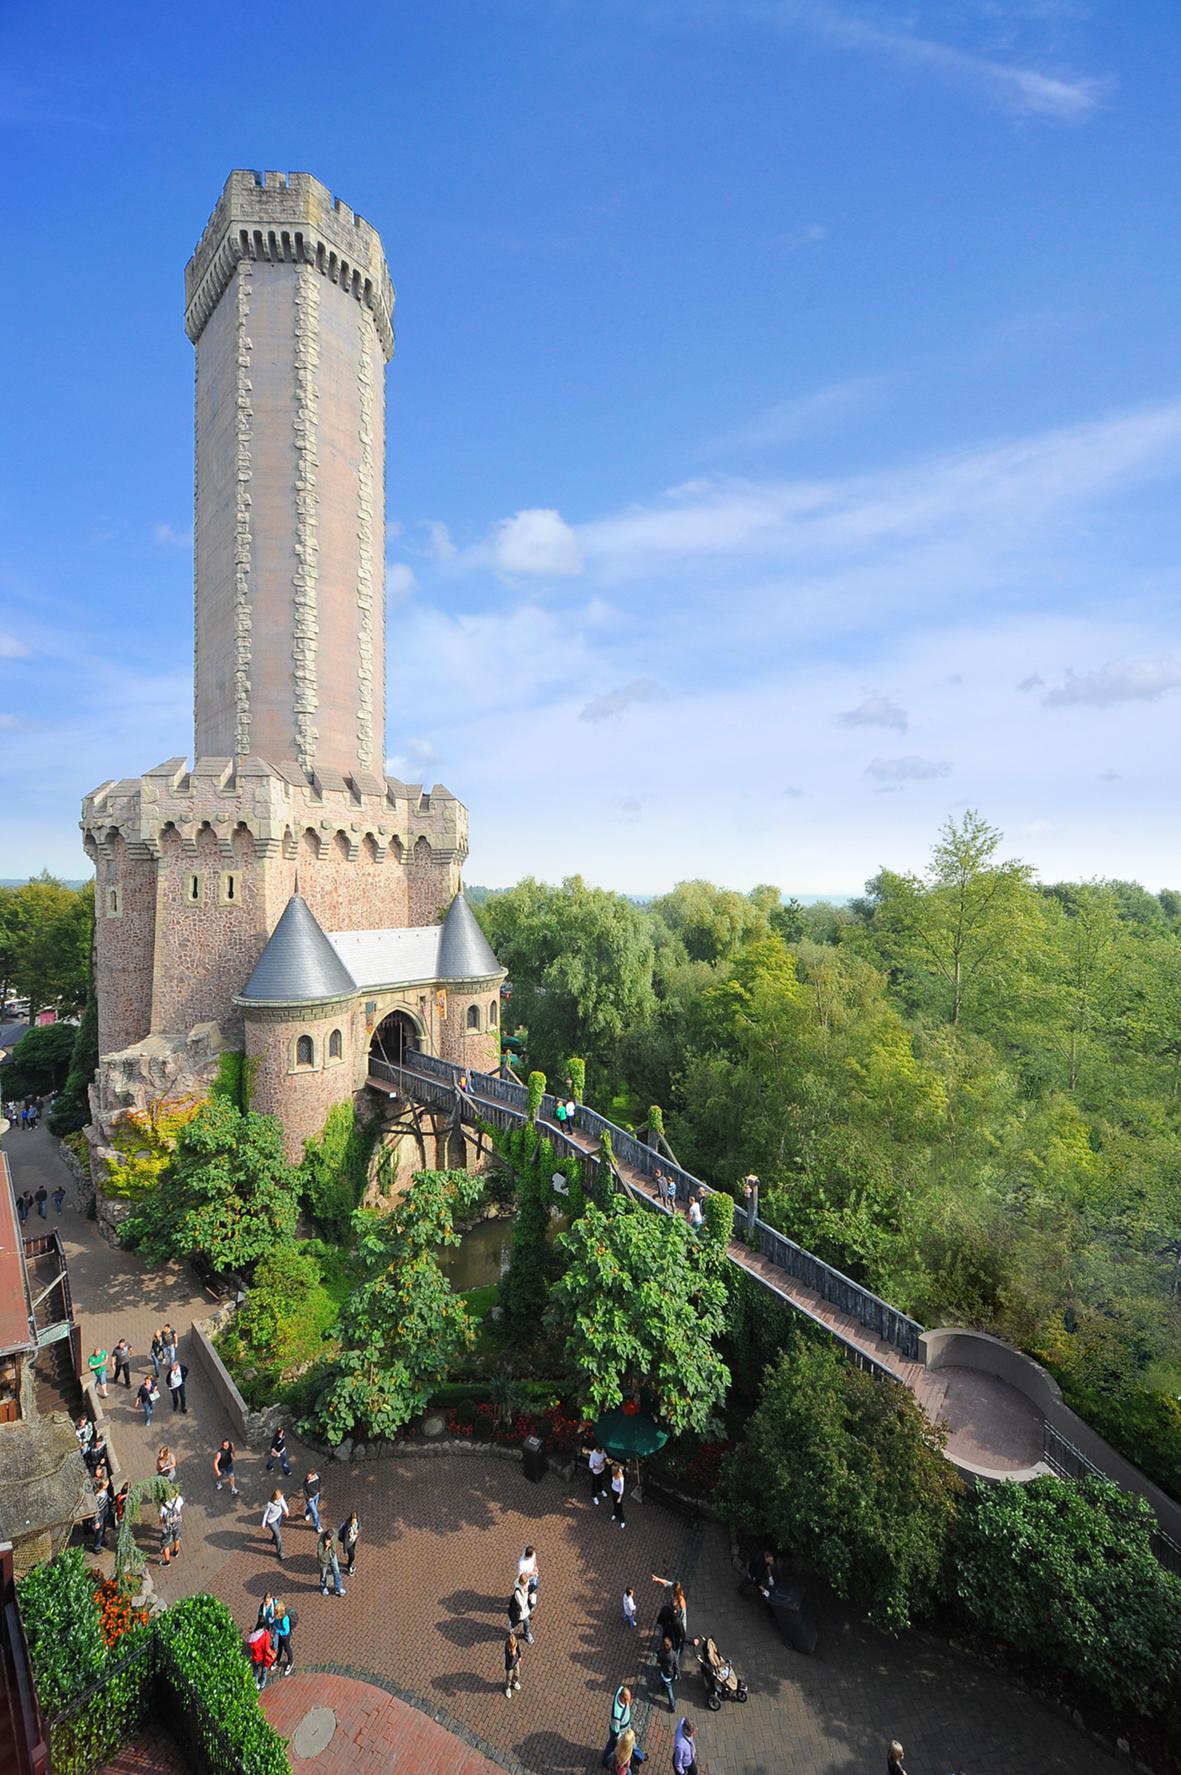 Mystery Castle, Bungee Drop Tower - weltweit einmalig